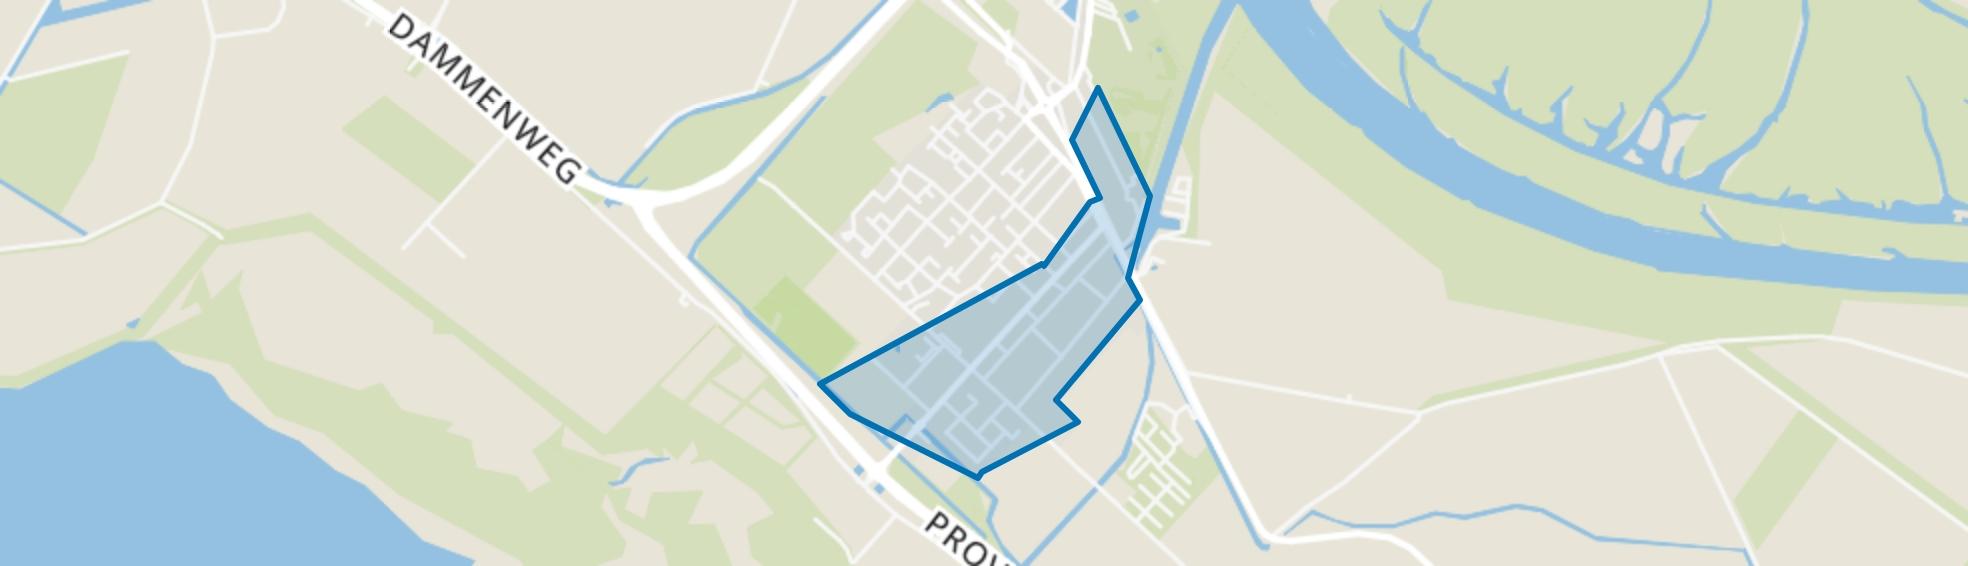 Stellendam centrum, Stellendam map